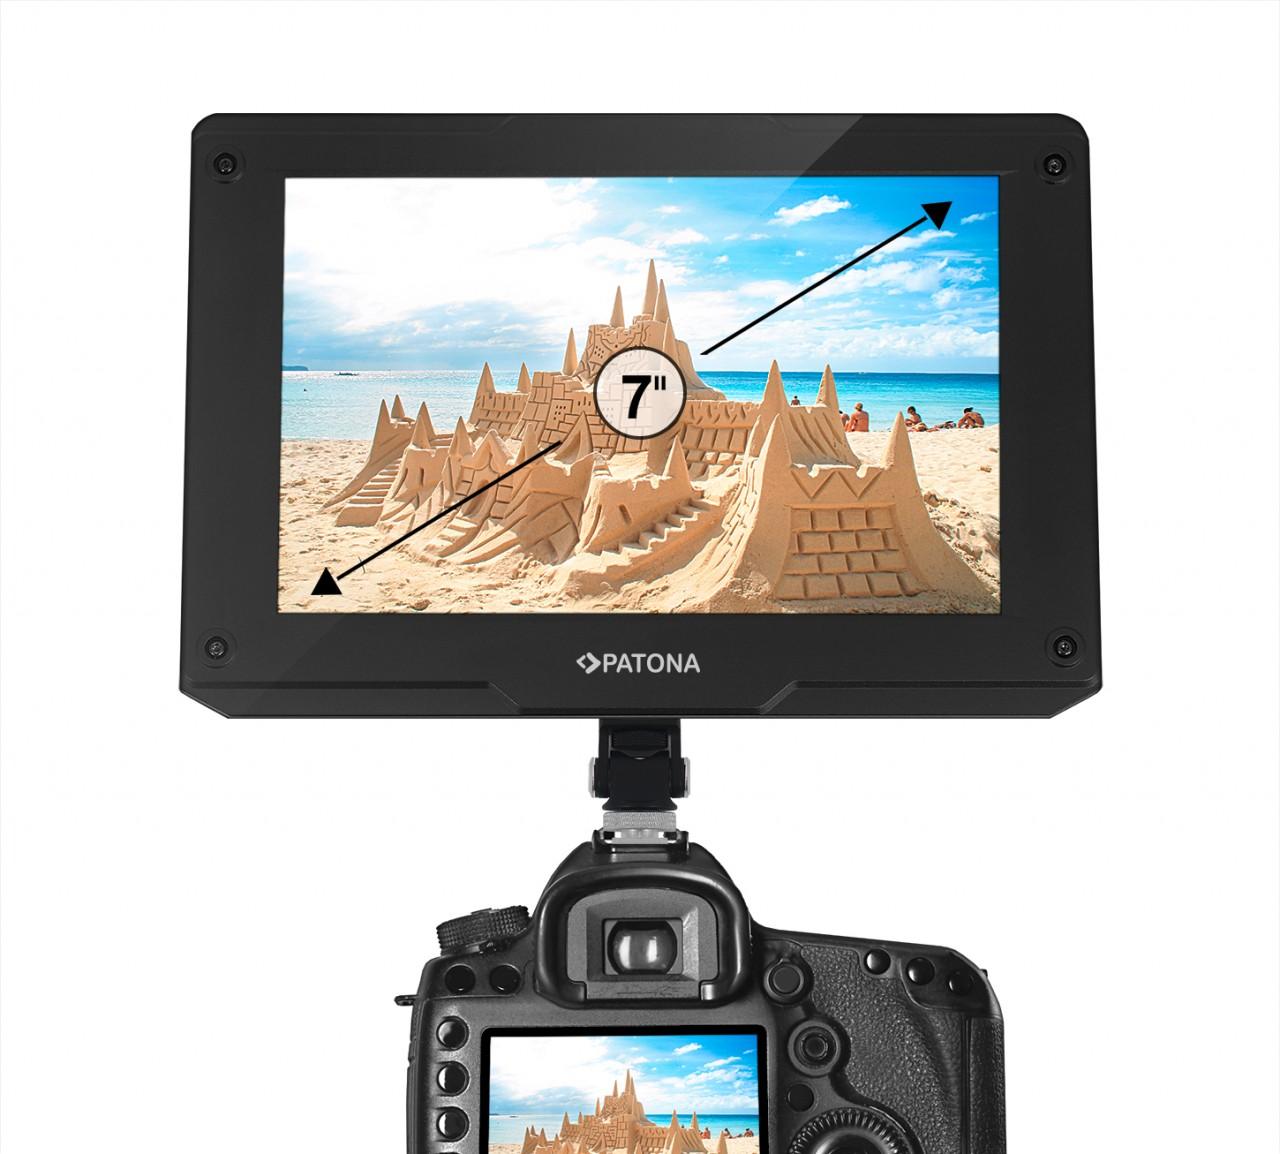 PATONA Premium LCD 3G-SDI monitor 7 inch HDMI 3D-LUT Test fi